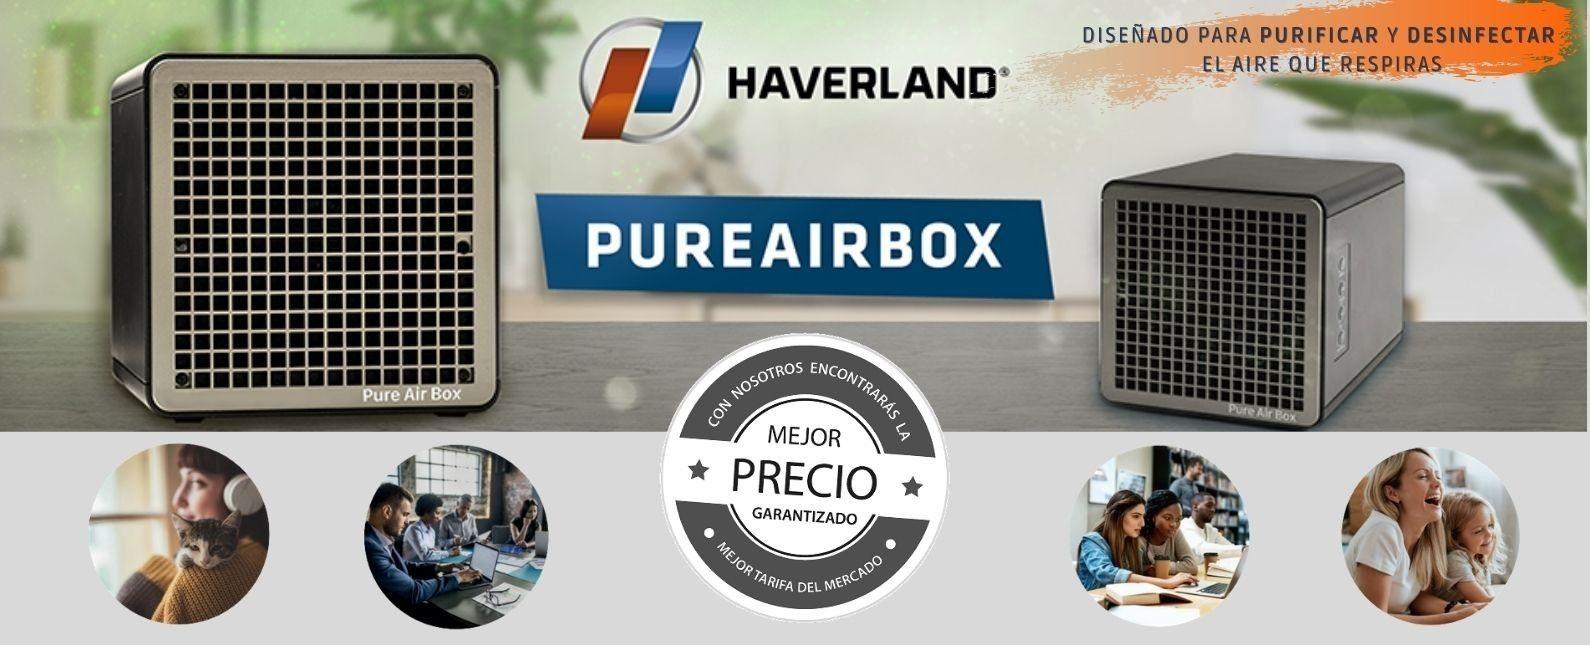 Purificador de aire Haverland Pure Air Box